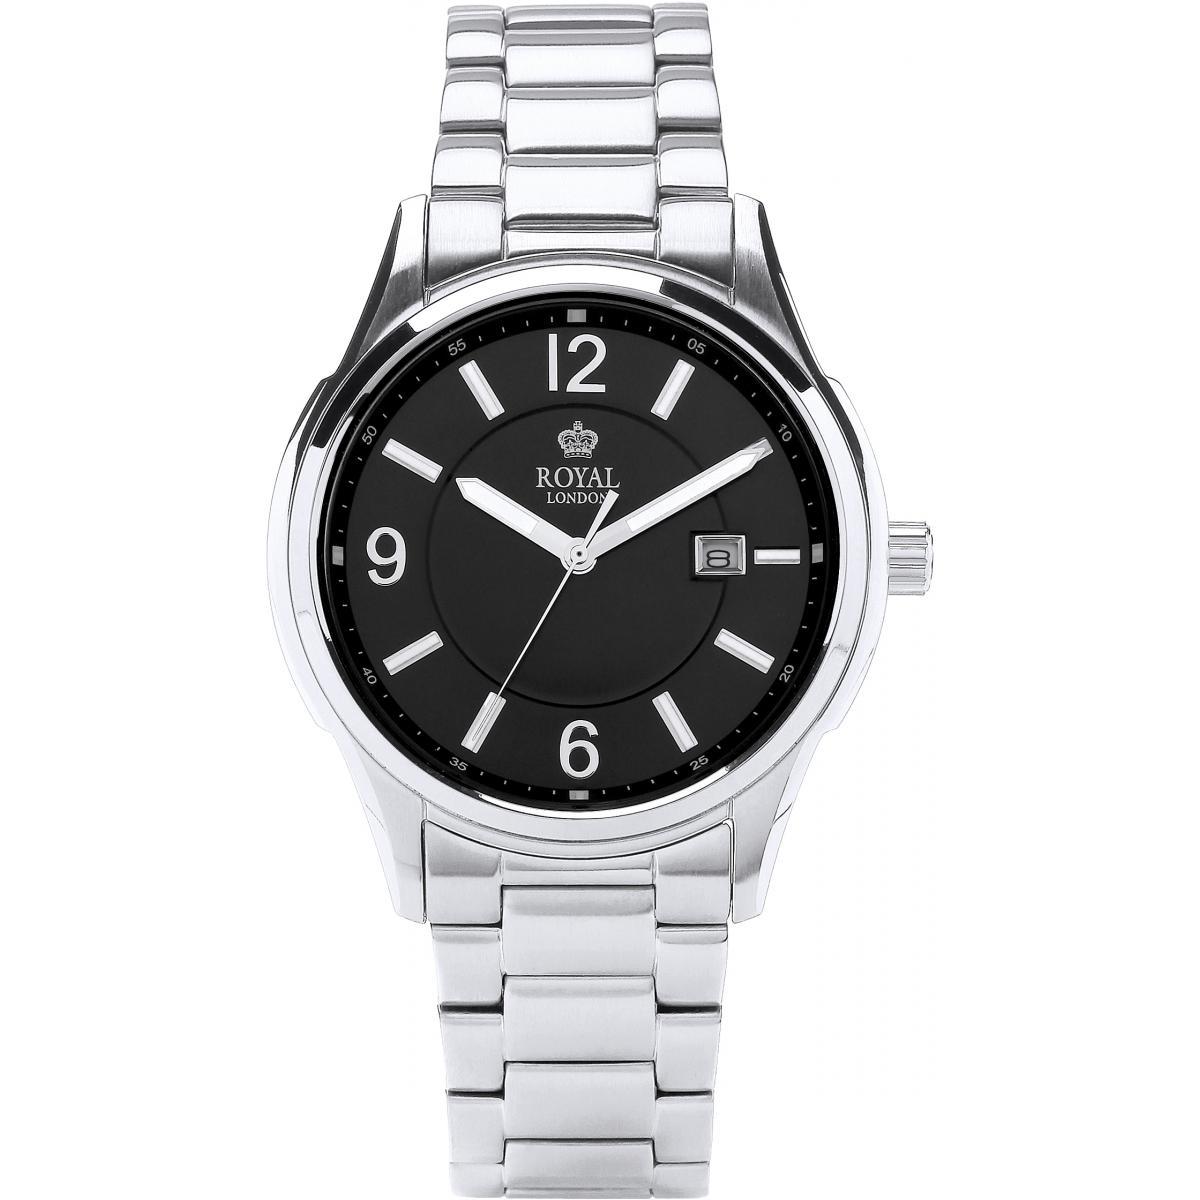 Achat de ma première montre (Royal London ?)